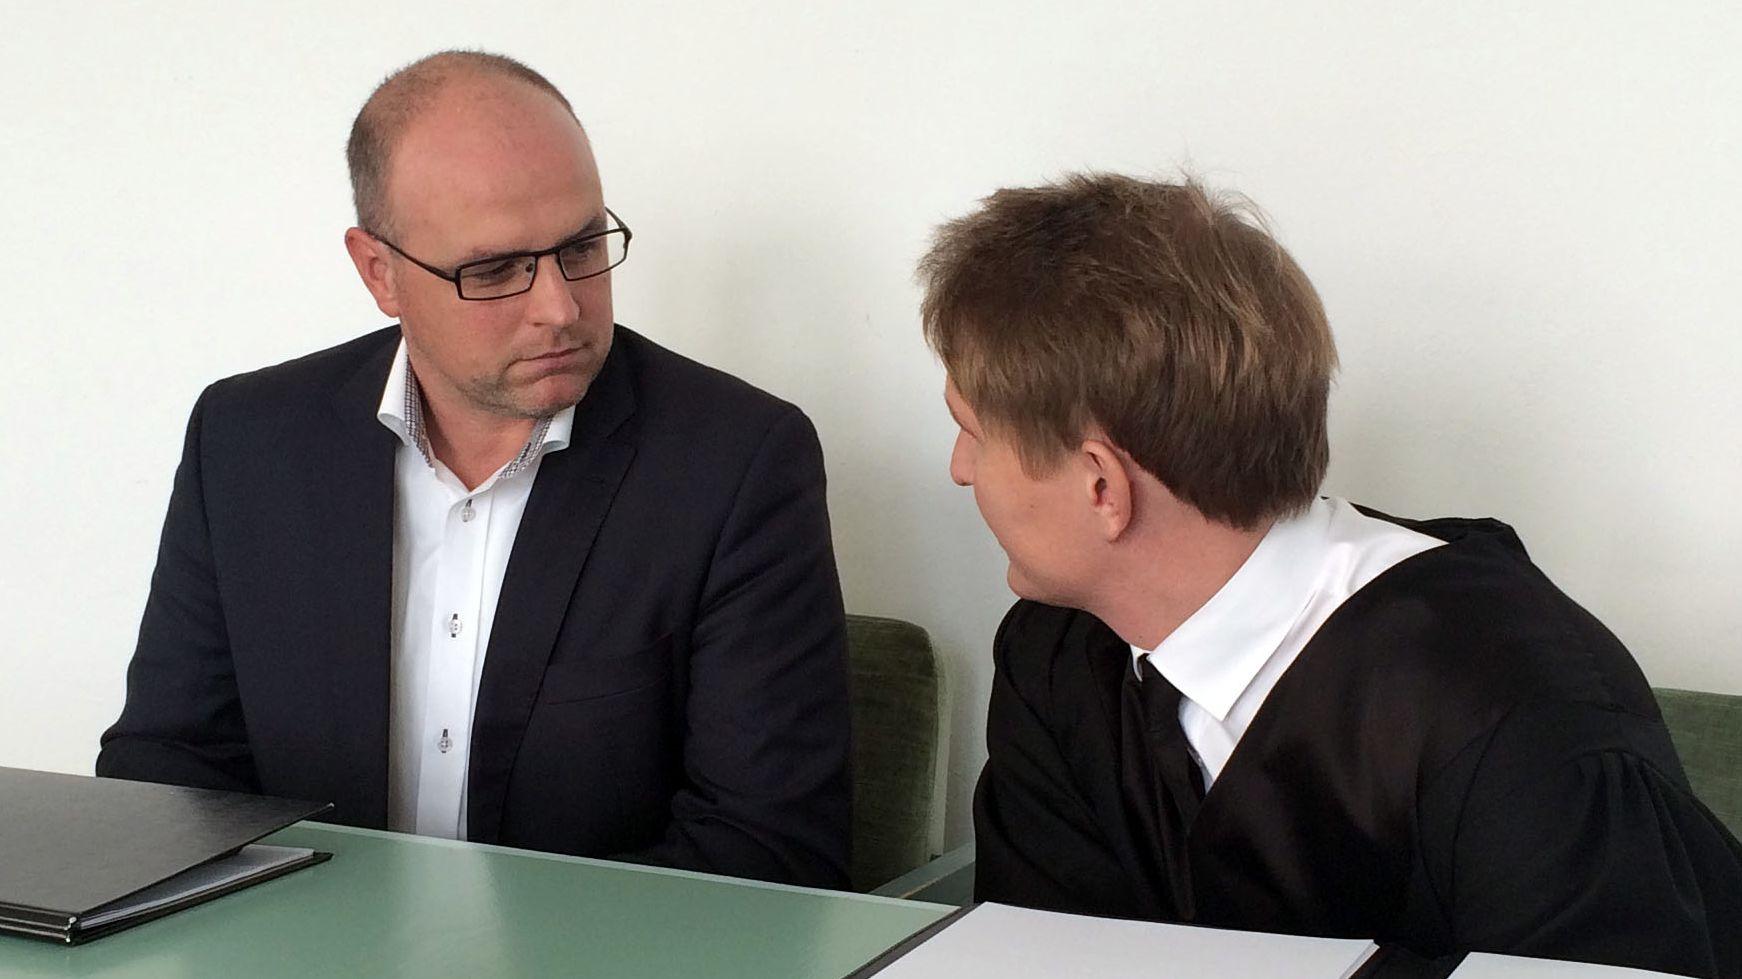 Der Immenreuther Bürgermeister Heinz Lorenz im Januar am Amtsgericht Tirschenreuth